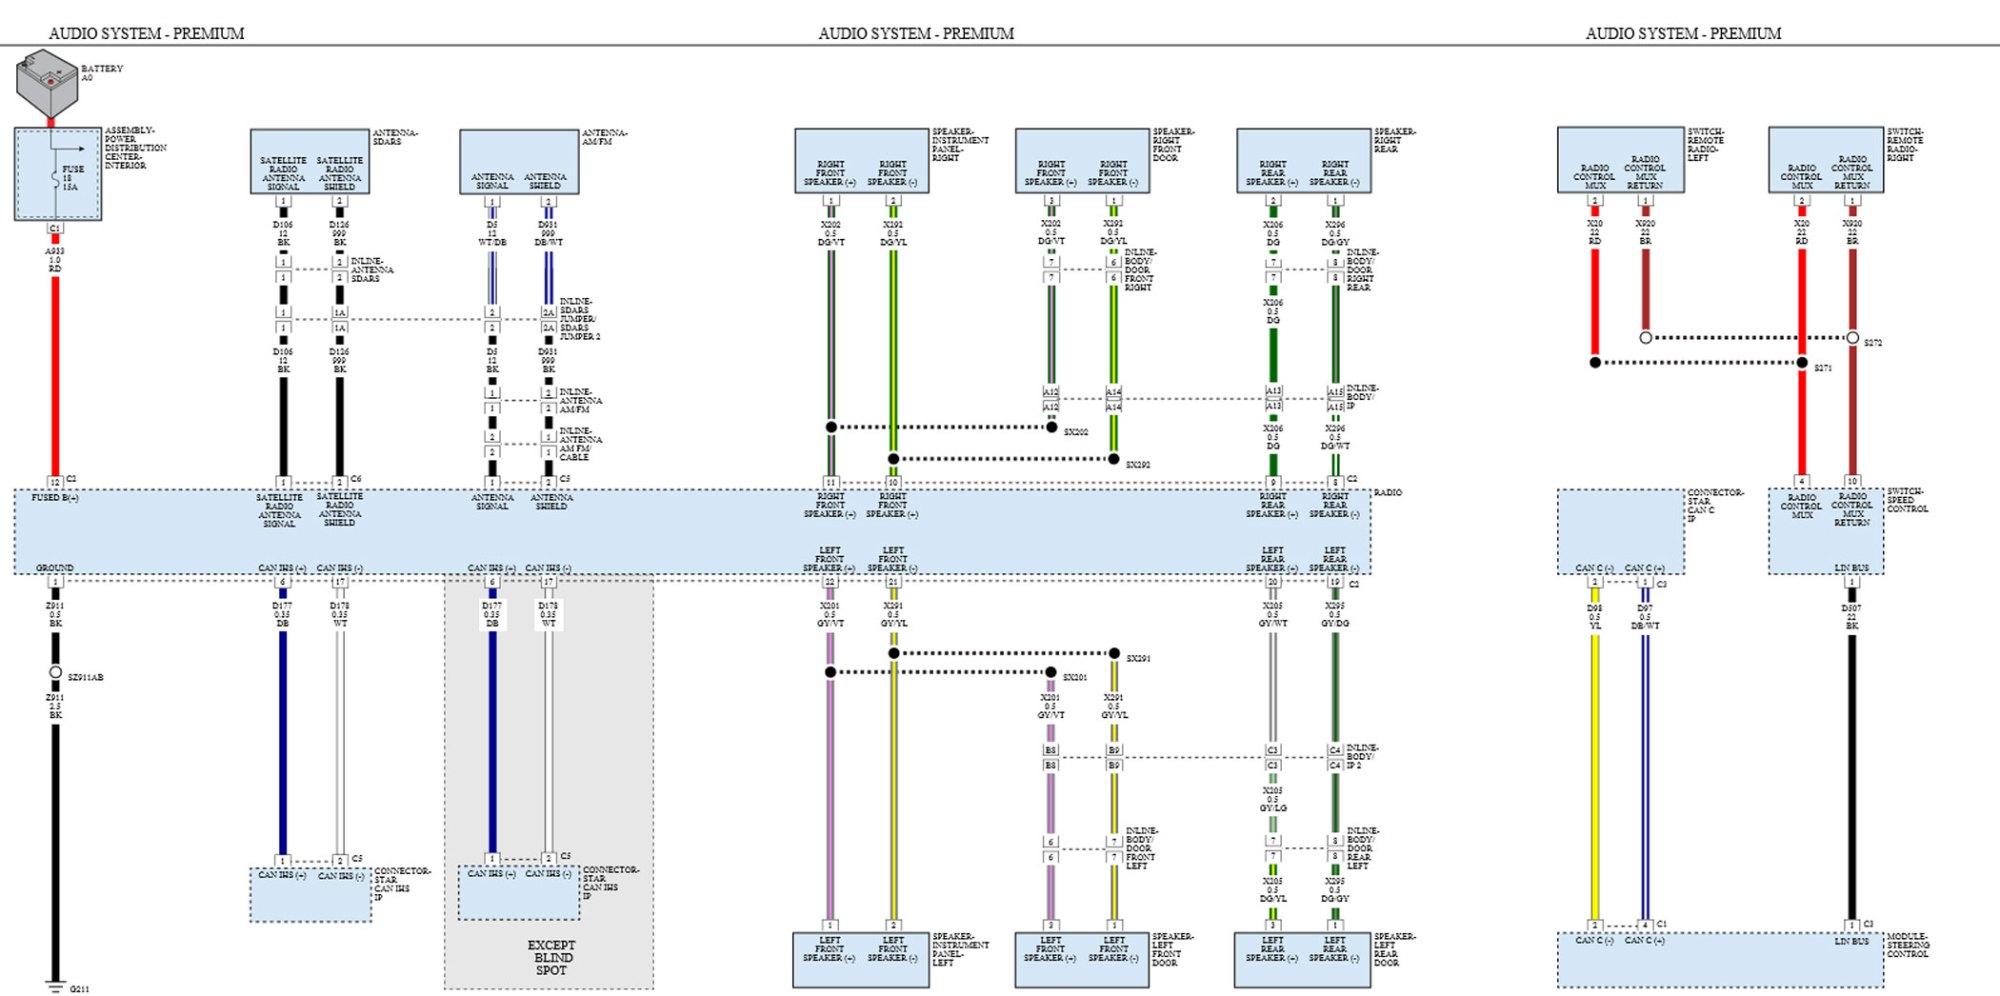 hight resolution of 2014 dodge ram alpine speaker wire colors adding lc7i to 8 4 6 speaker system